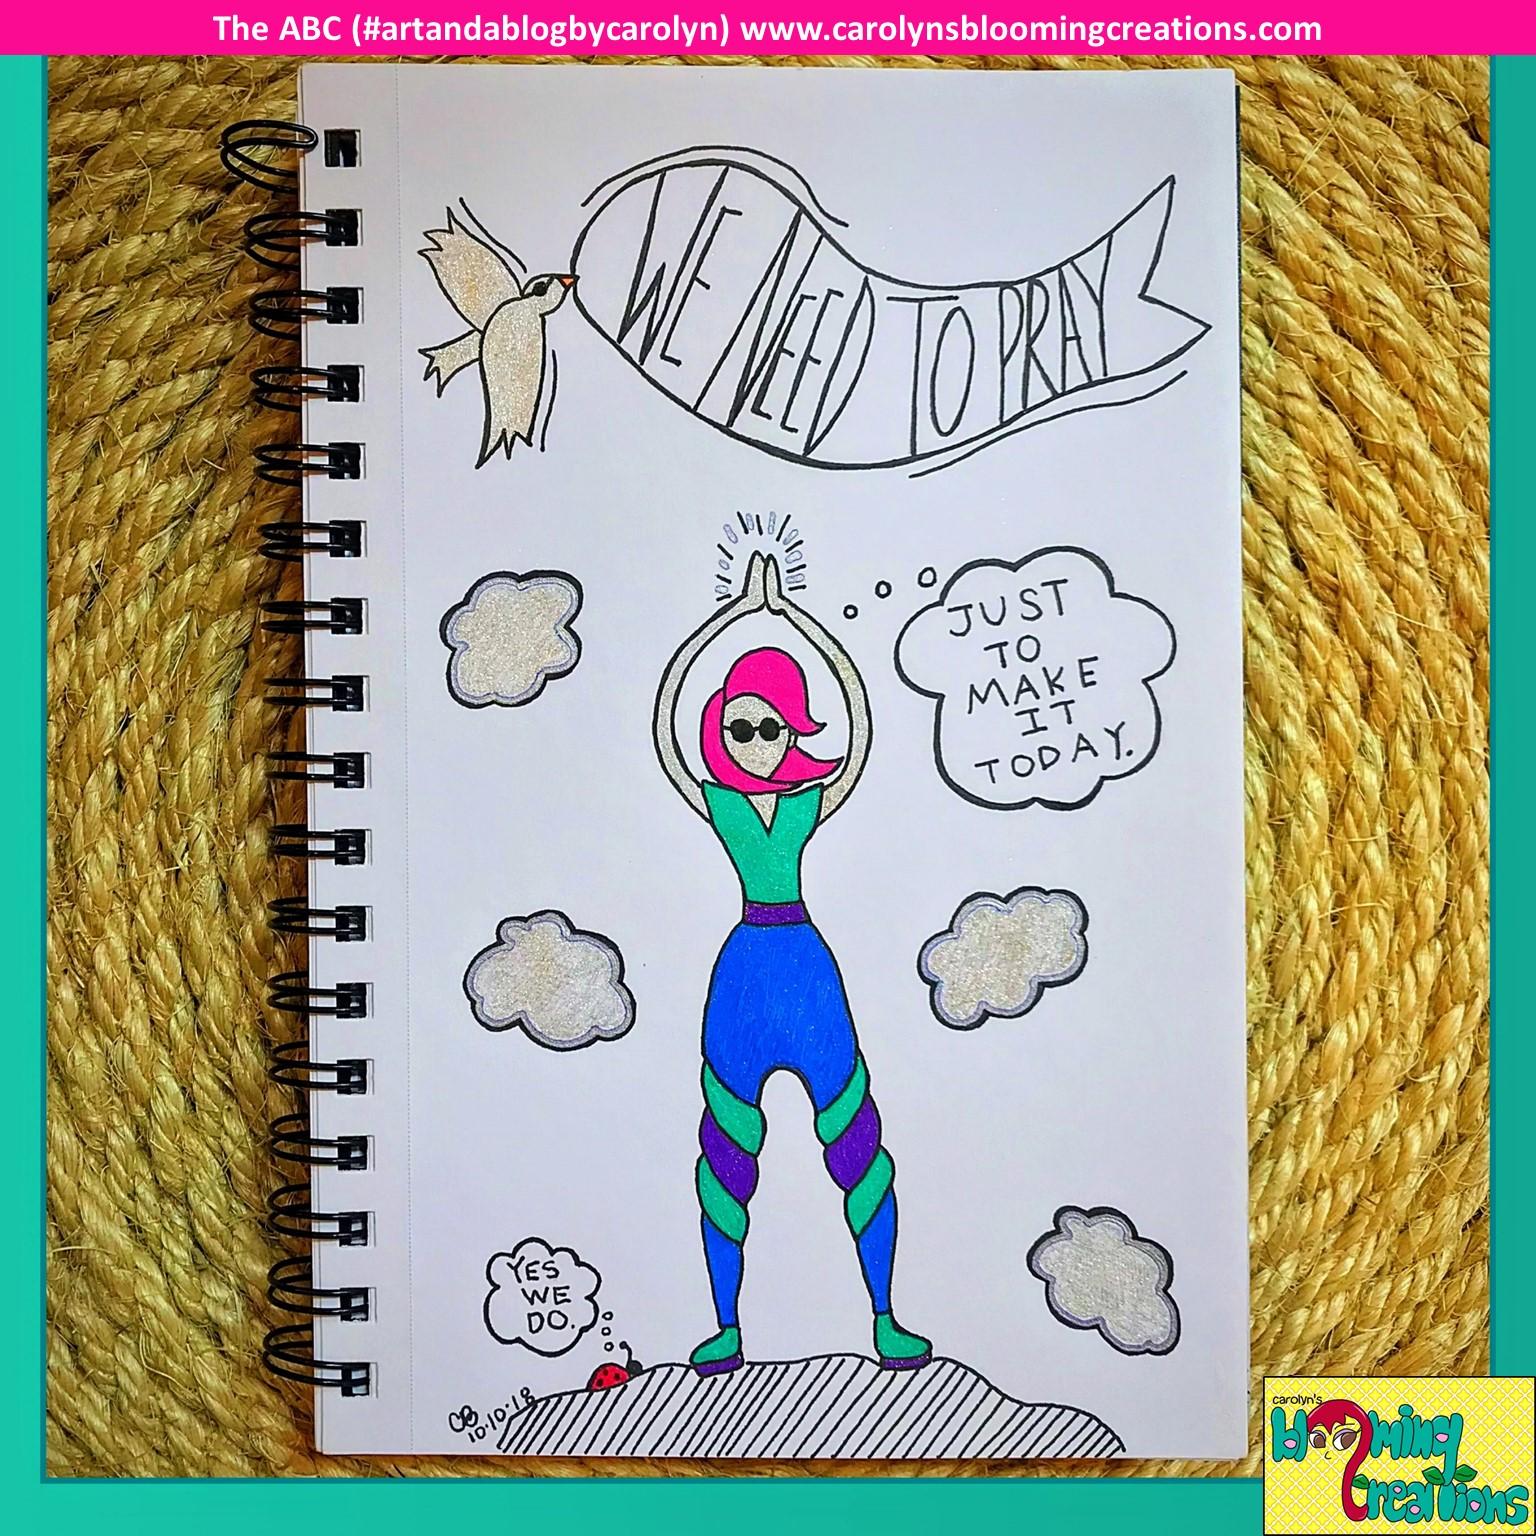 Art by Carolyn J. Braden, Media: Gelly Roll pens by Sakura and BIC pencil